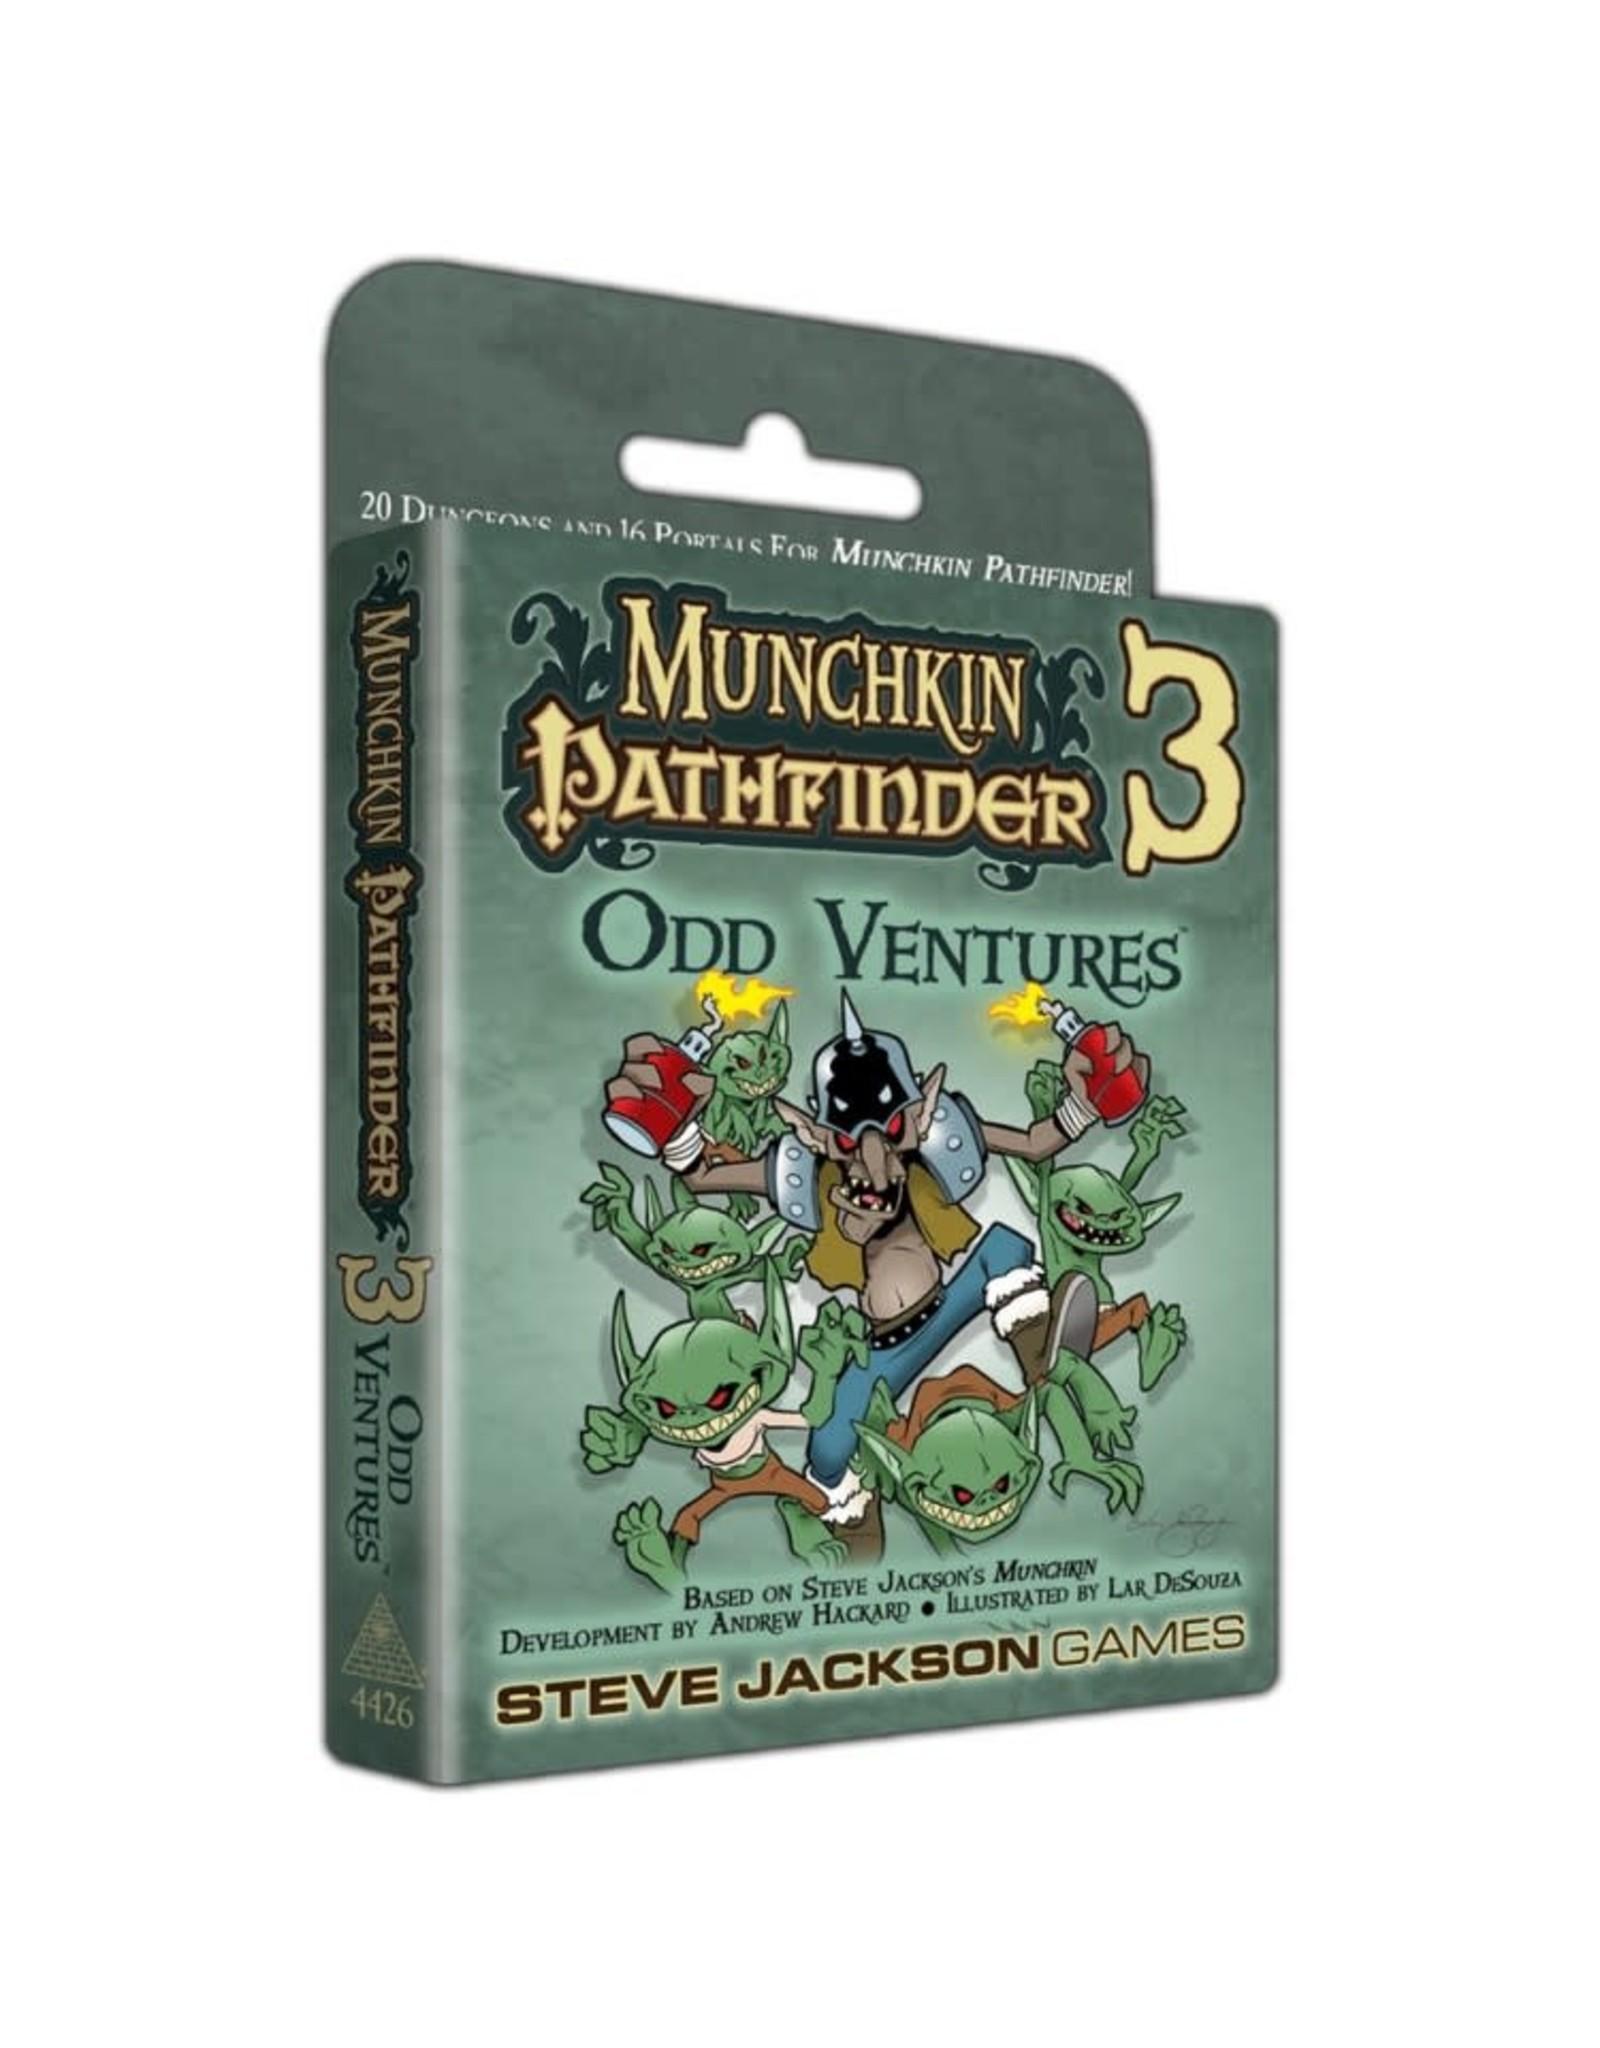 Steve Jackson Games Munchkin Pathfinder 3: Odd Ventures